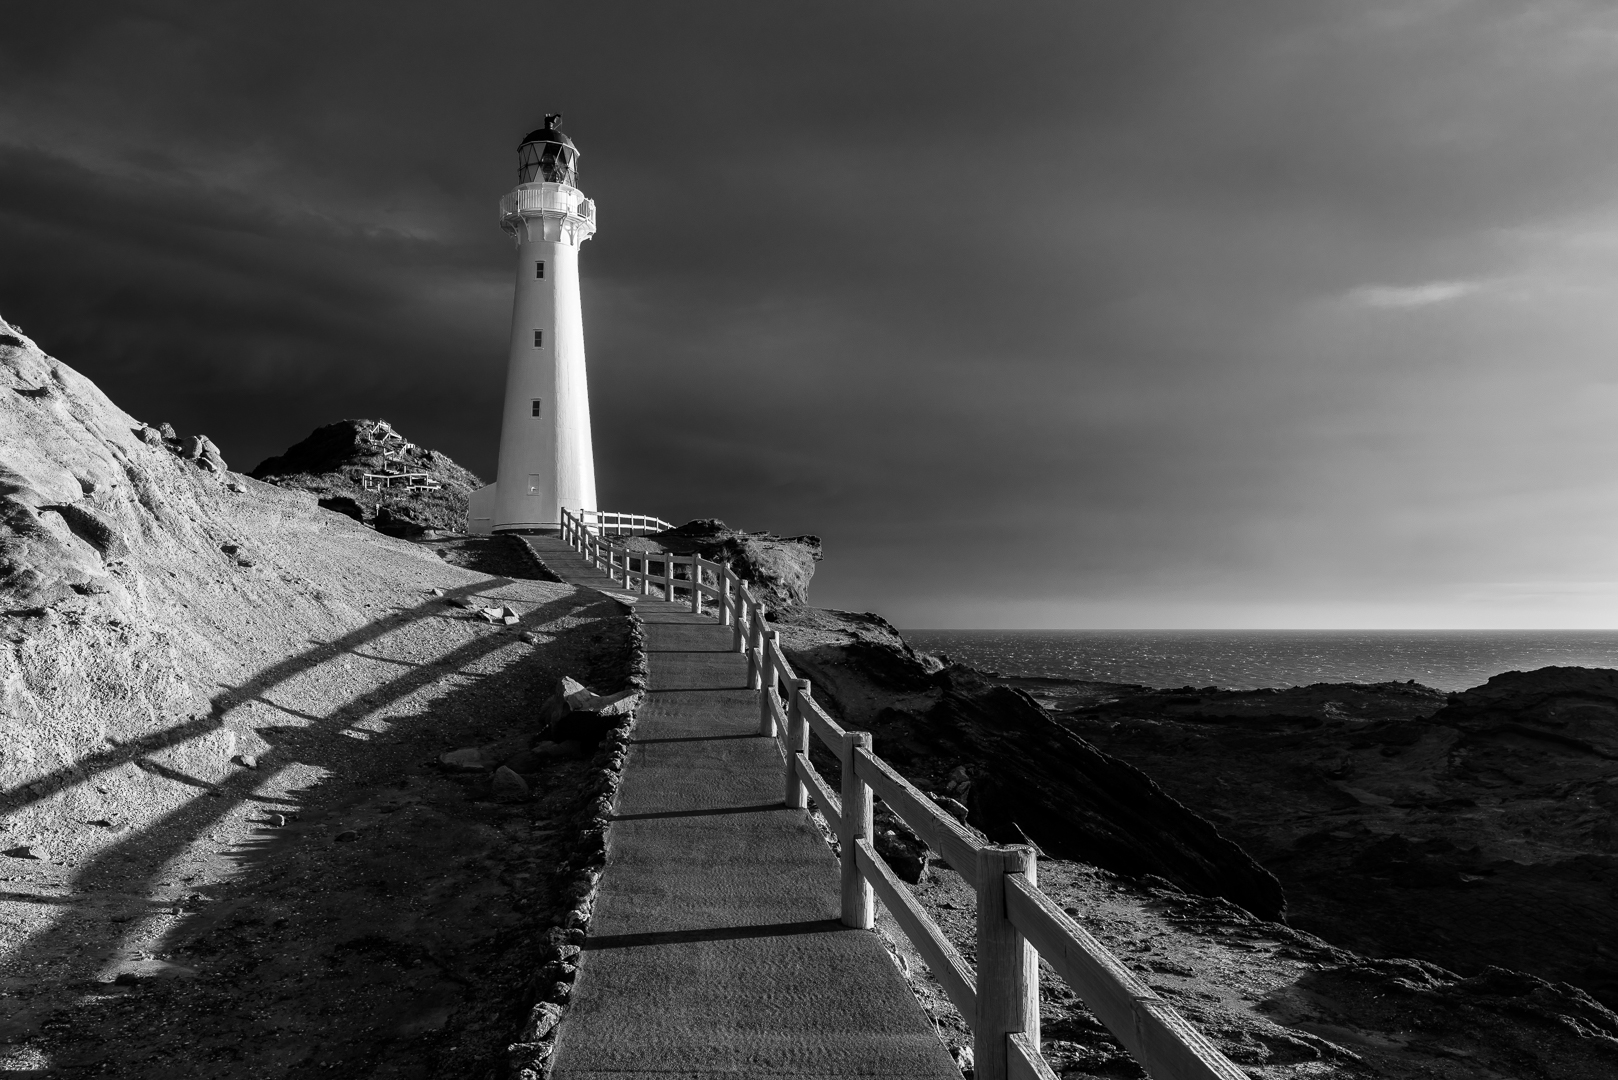 Castlepoint lighthouse, New Zealand